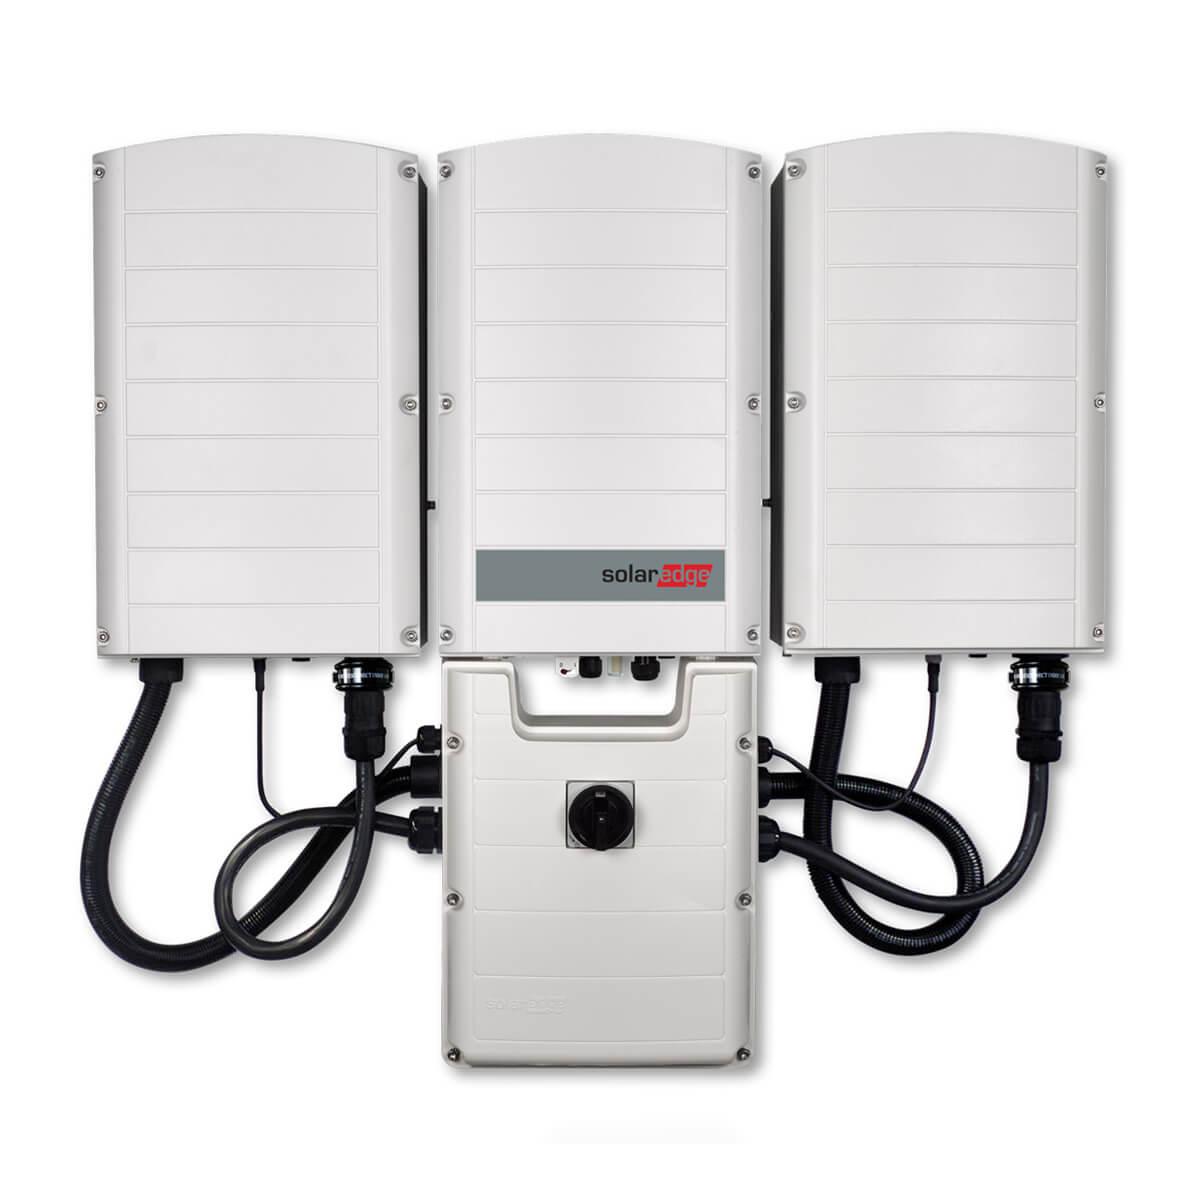 solaredge 50kW inverter, solaredge se50k 50kW inverter, solaredge se50k inverter, solaredge se50k, solaredge 50 kW, SOLAREDGE 50KW